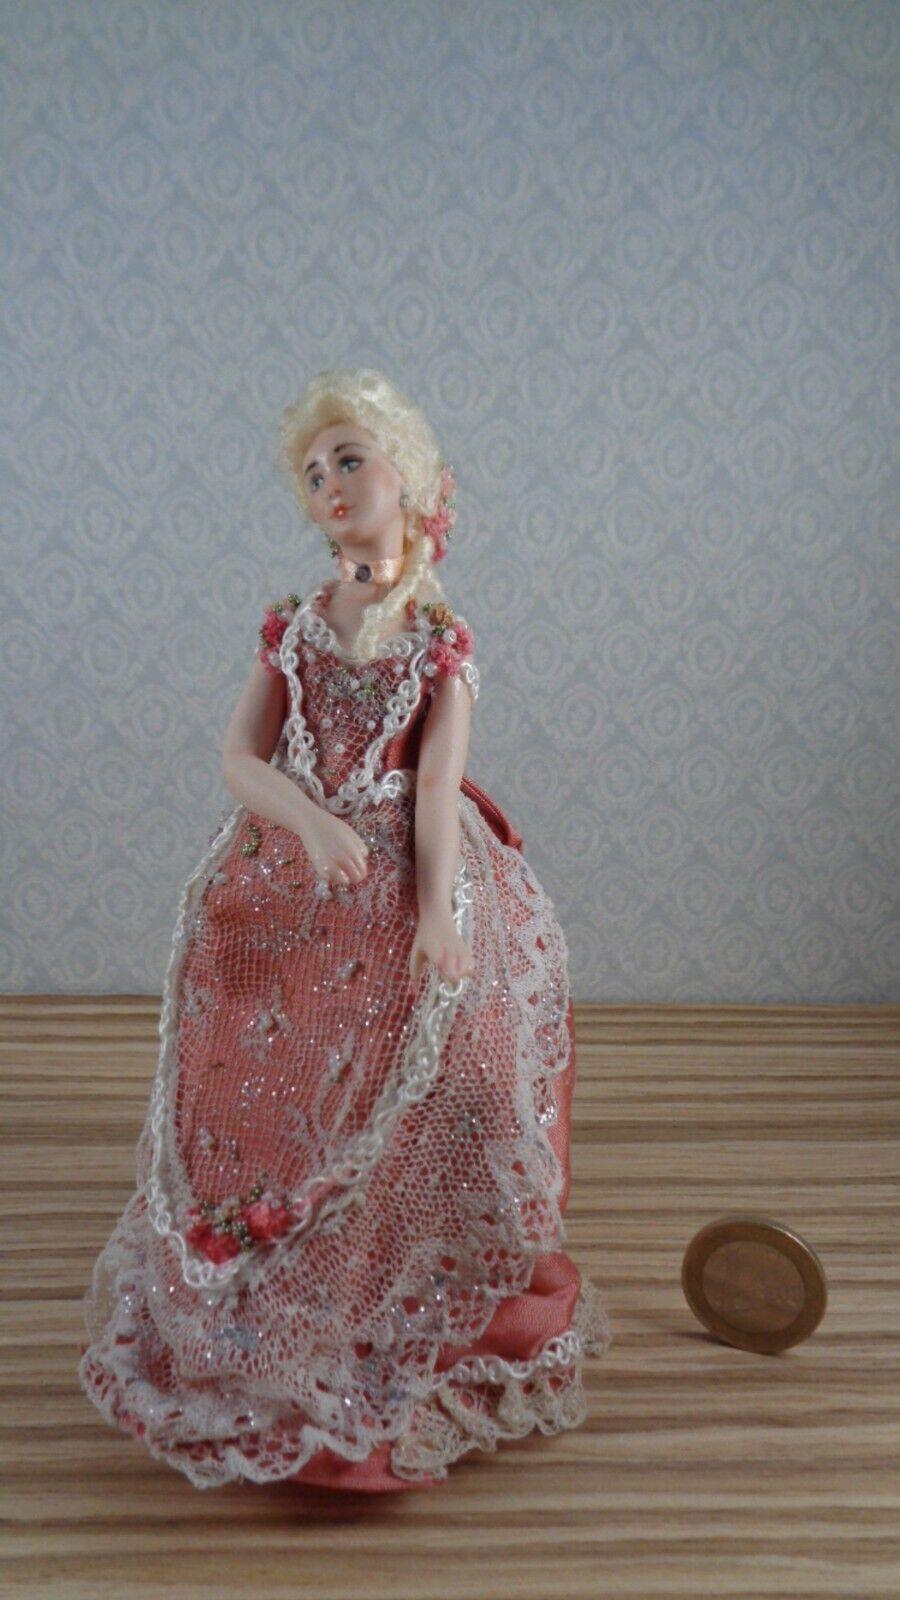 vendita online MINIATURE bambola    OOAK  bambolaHOUSE  1 12 SCALE  PORCELAIN  più sconto